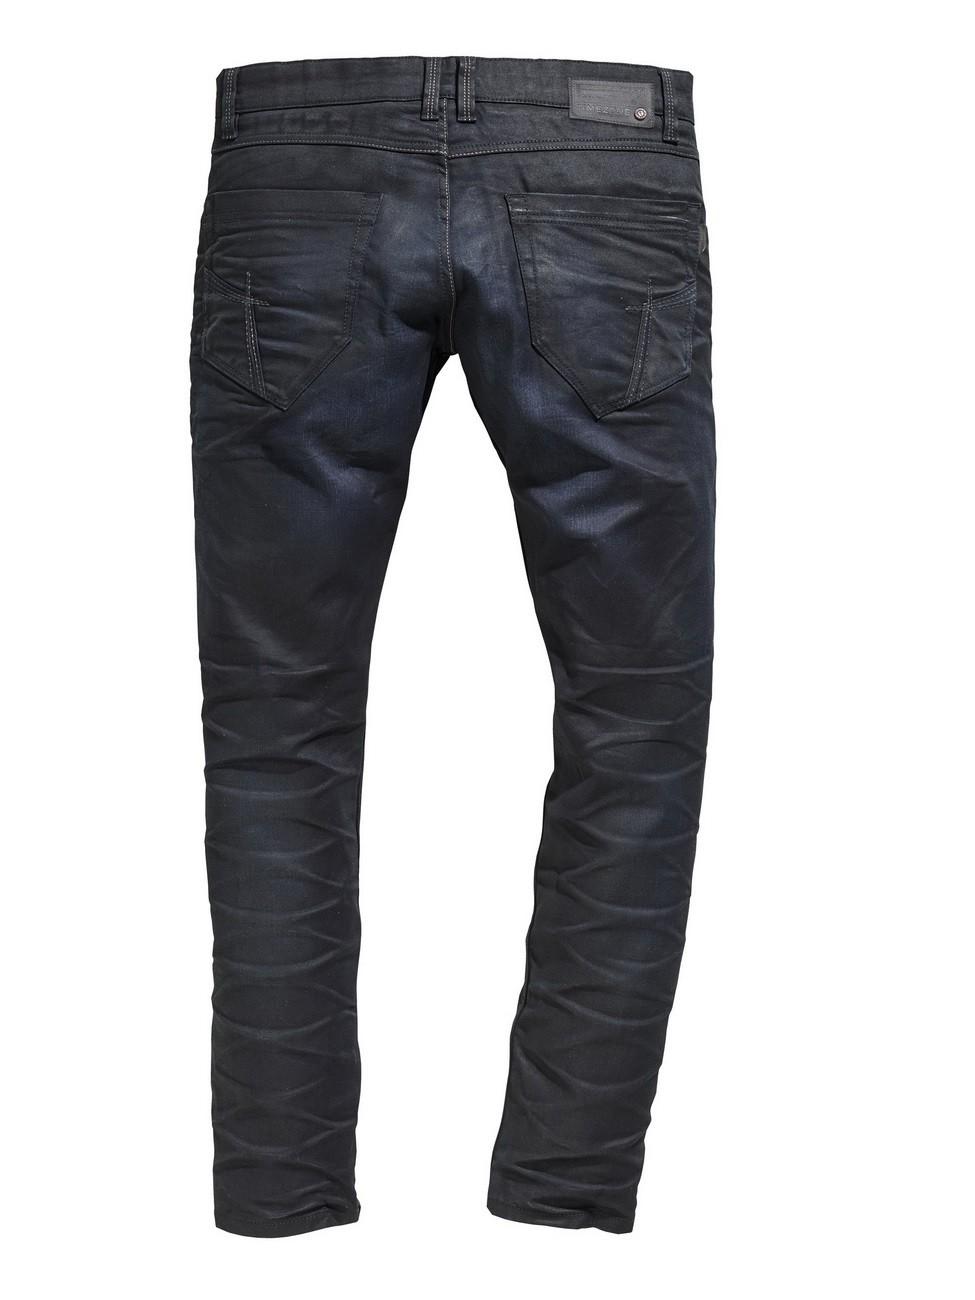 timezone herren jeans eduardotz slim fit blau indigo. Black Bedroom Furniture Sets. Home Design Ideas